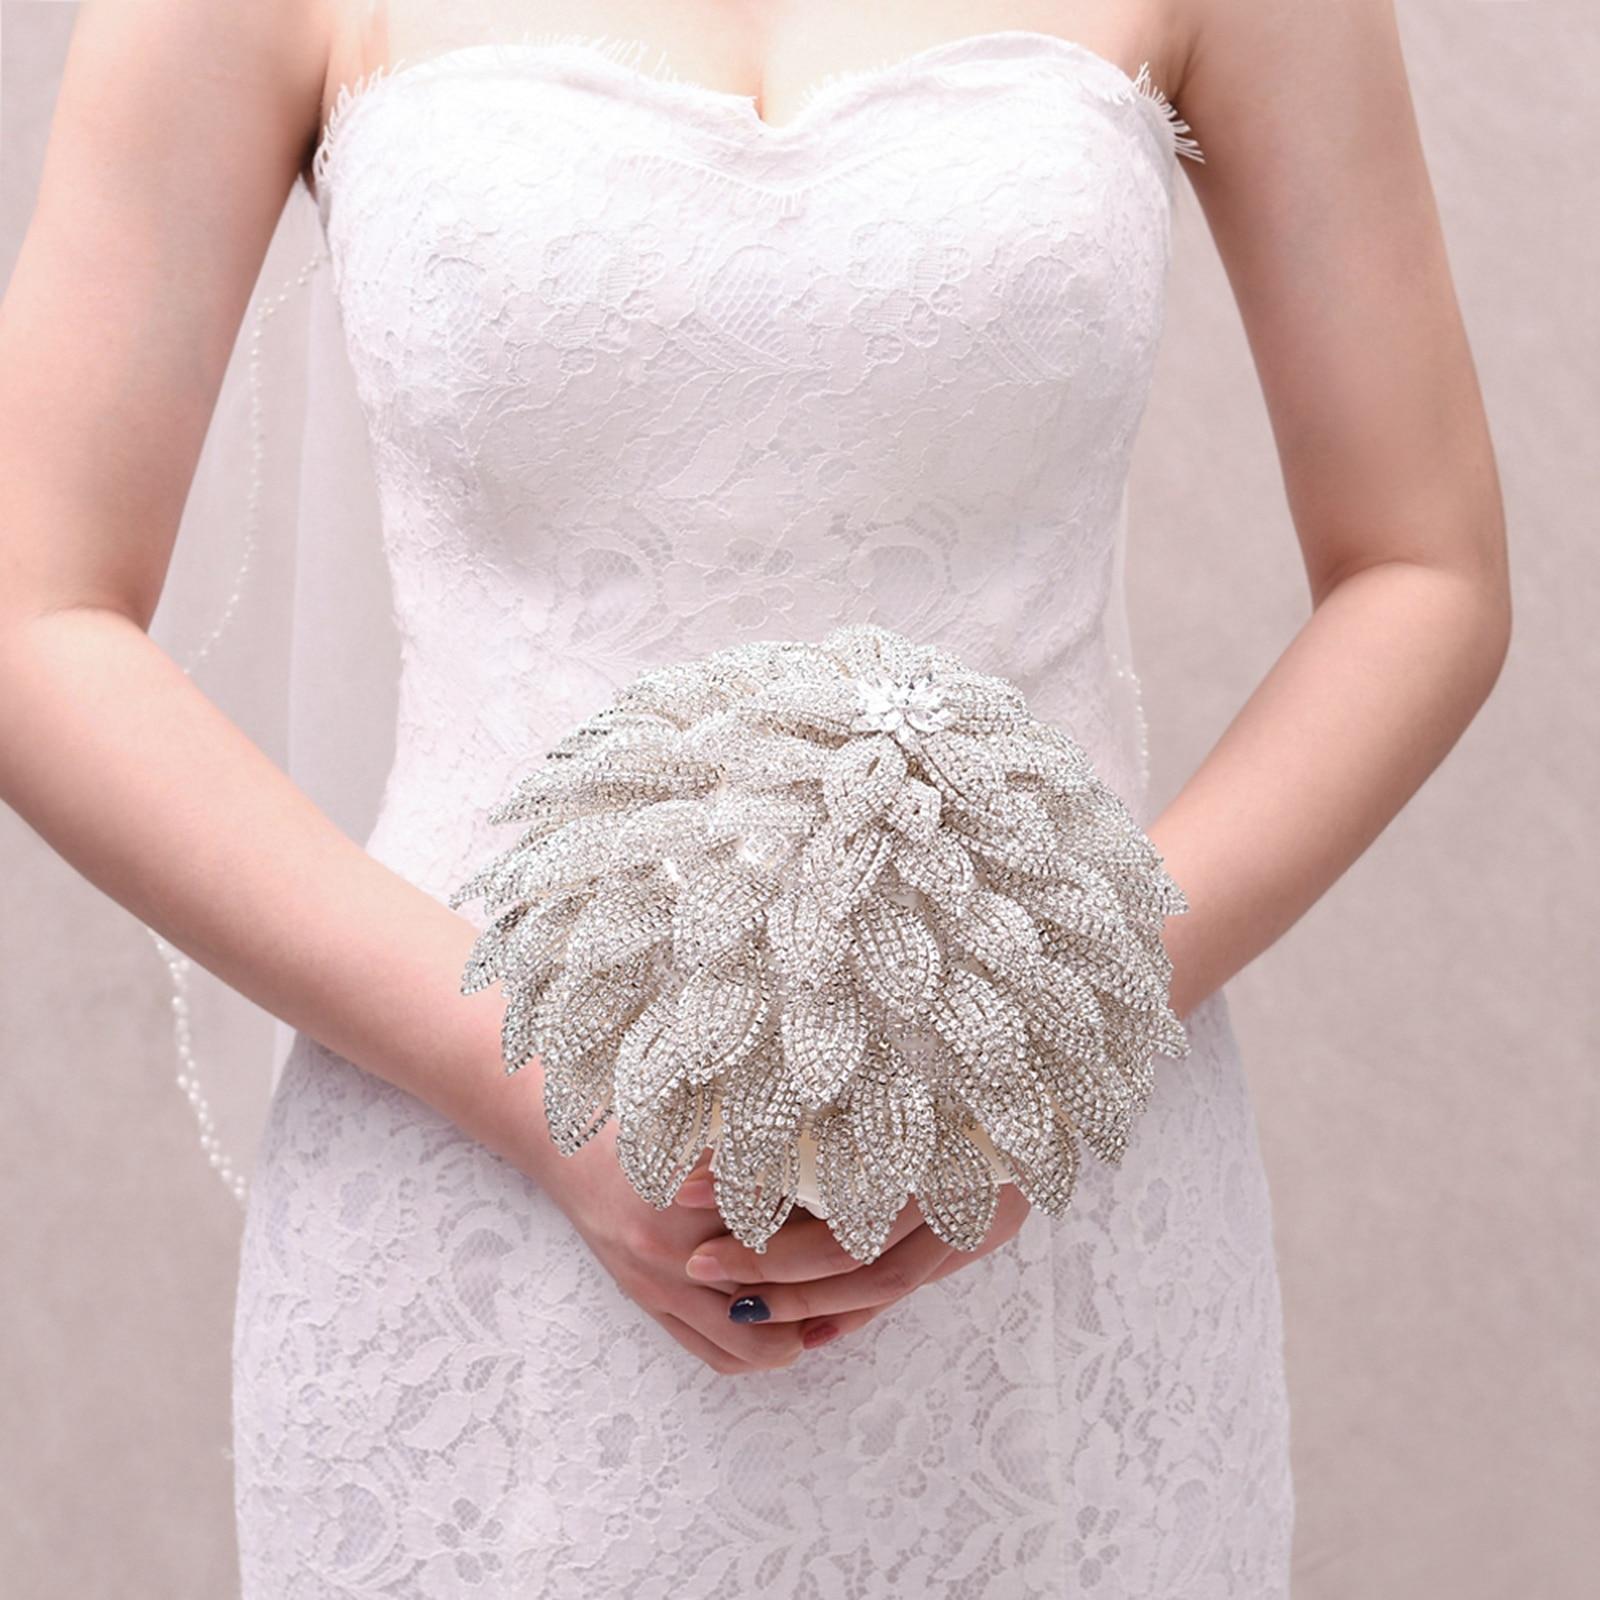 Handmade Crystal Bouquet Wedding Flower Accessories Bridal Bouquet Rhinestone Luxury Wedding Flowers Bridal Bouquets Bridesmaid недорого